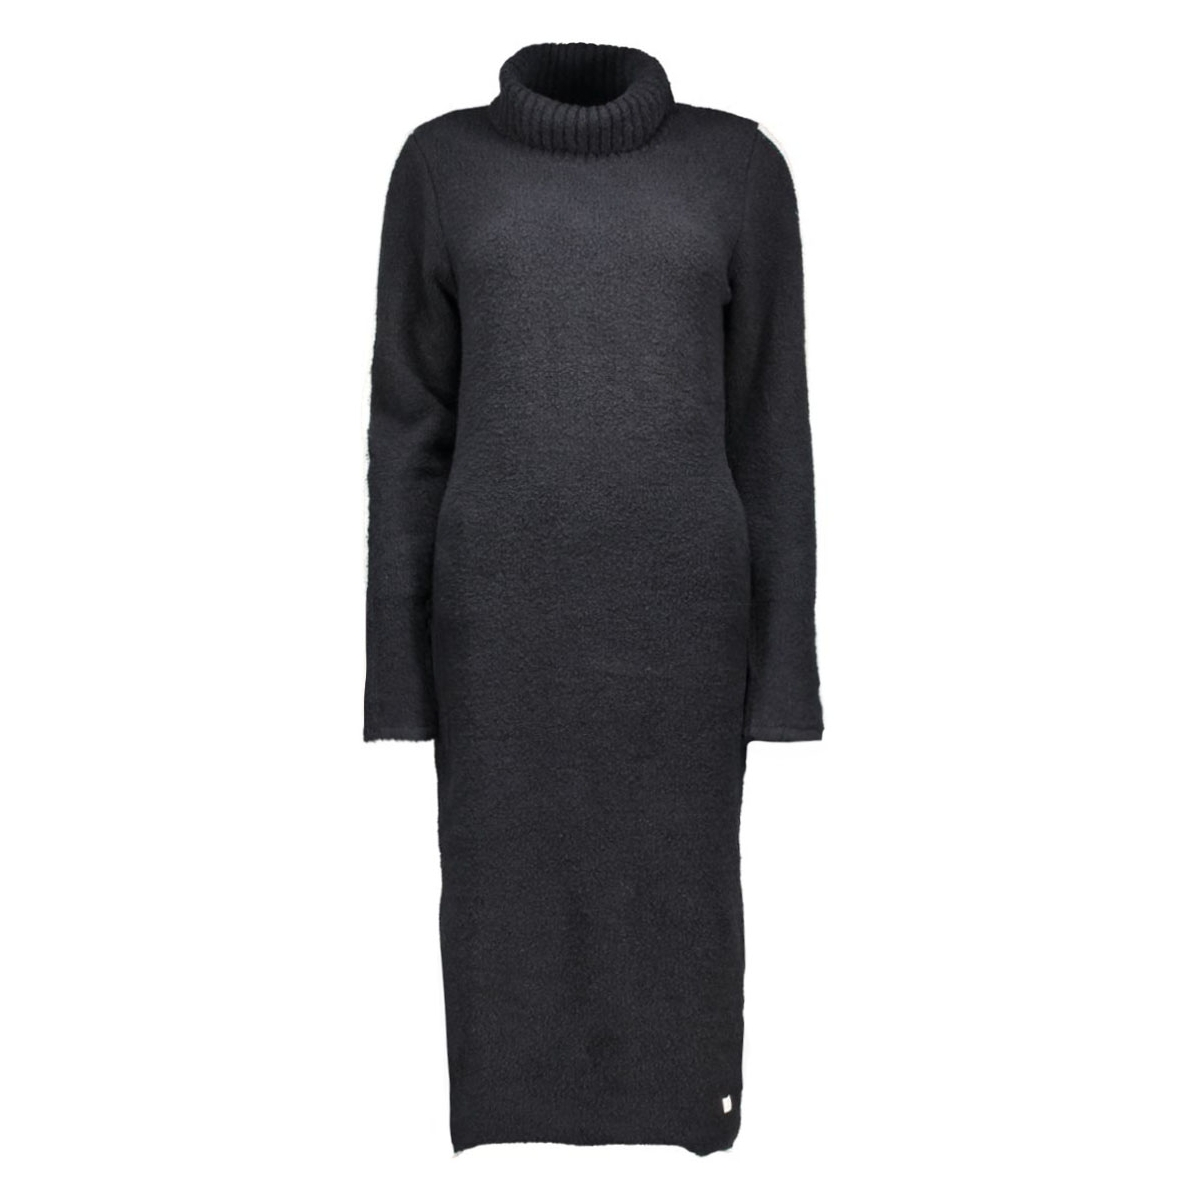 sarco wincot osi femmes jurk black